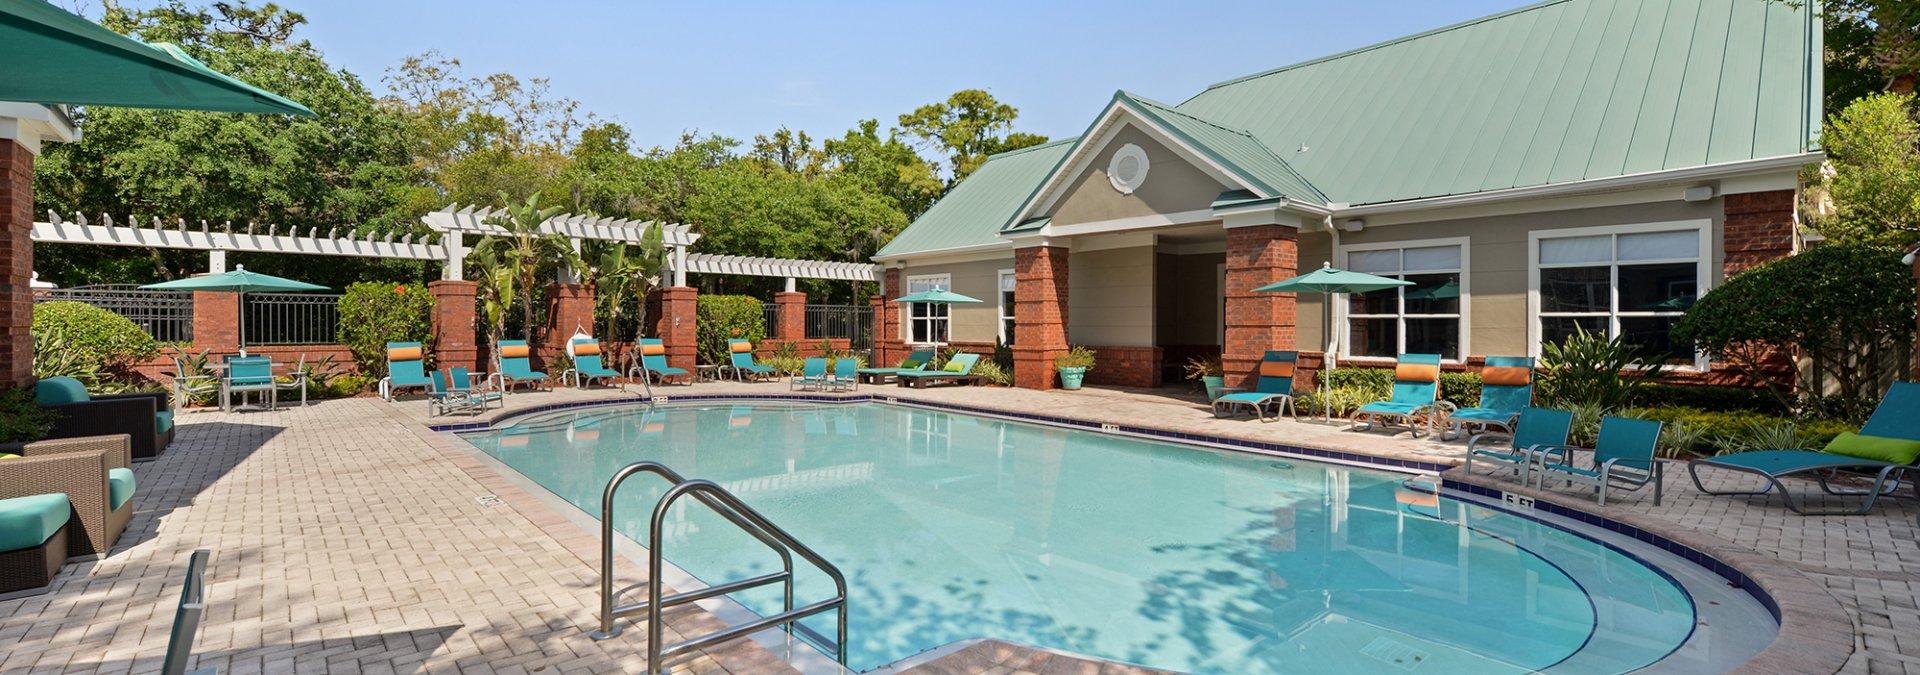 Sparkling Pool | USF Apartments | The Social at South Florida